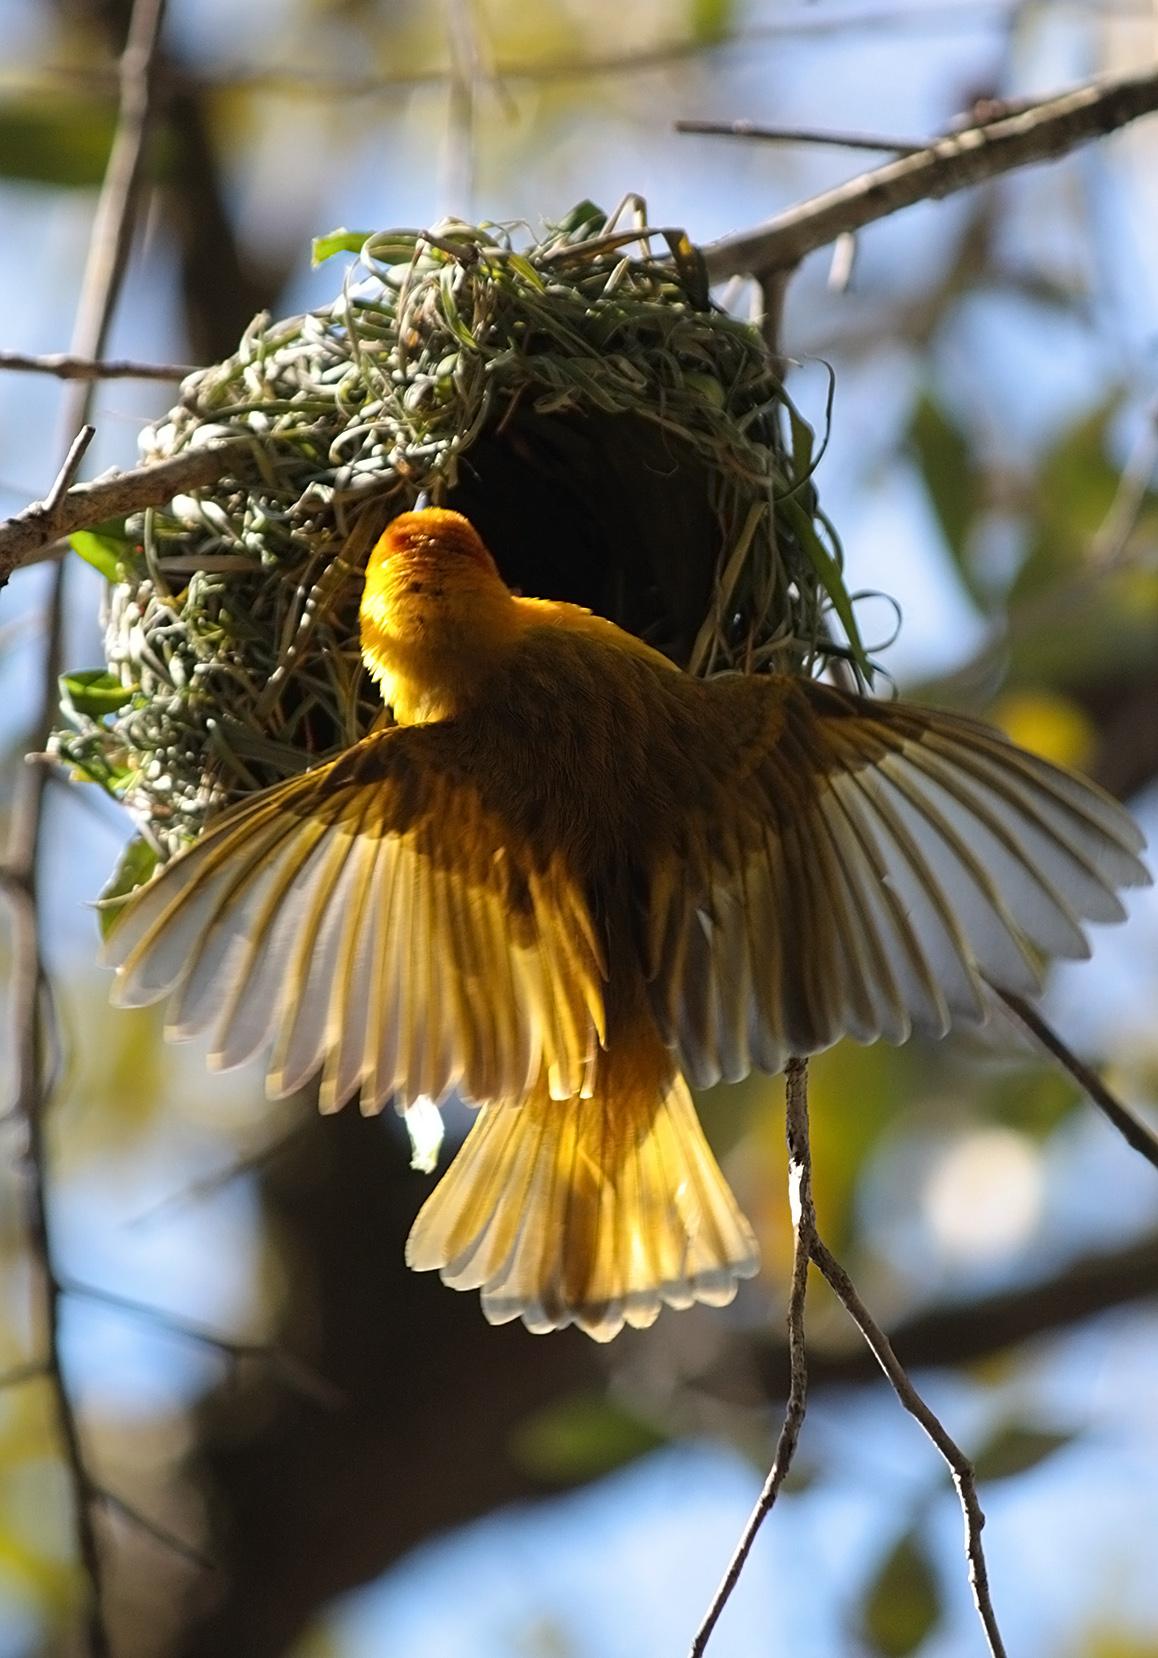 AfricanWeaver bird nesting at Disney's Animal Kingdom park